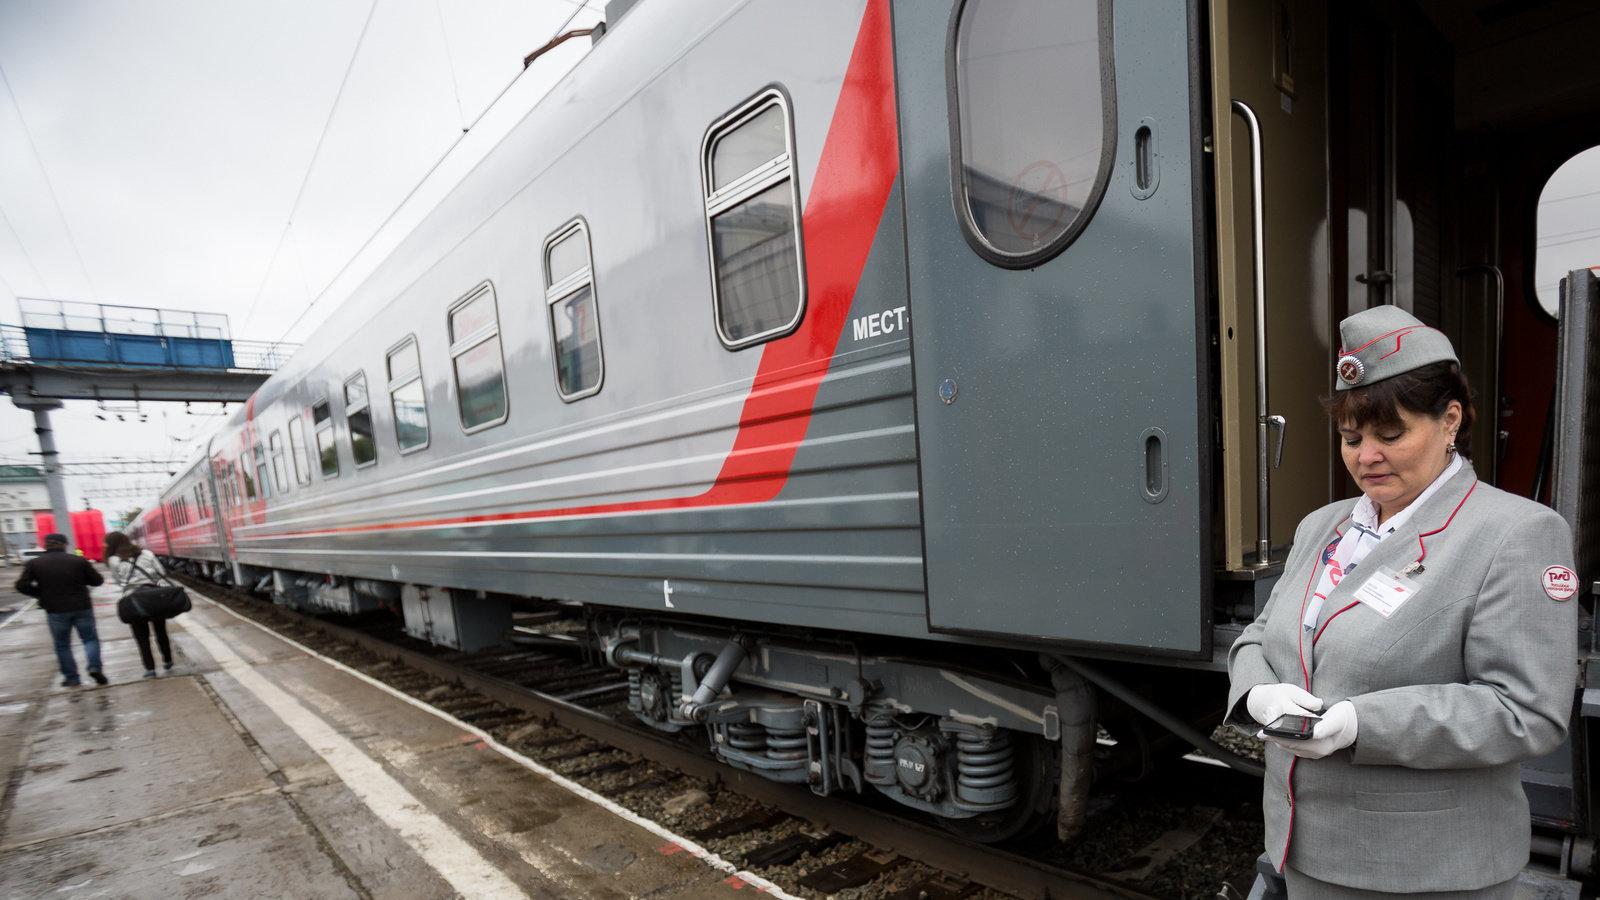 фото проводниц поезда томск анапа